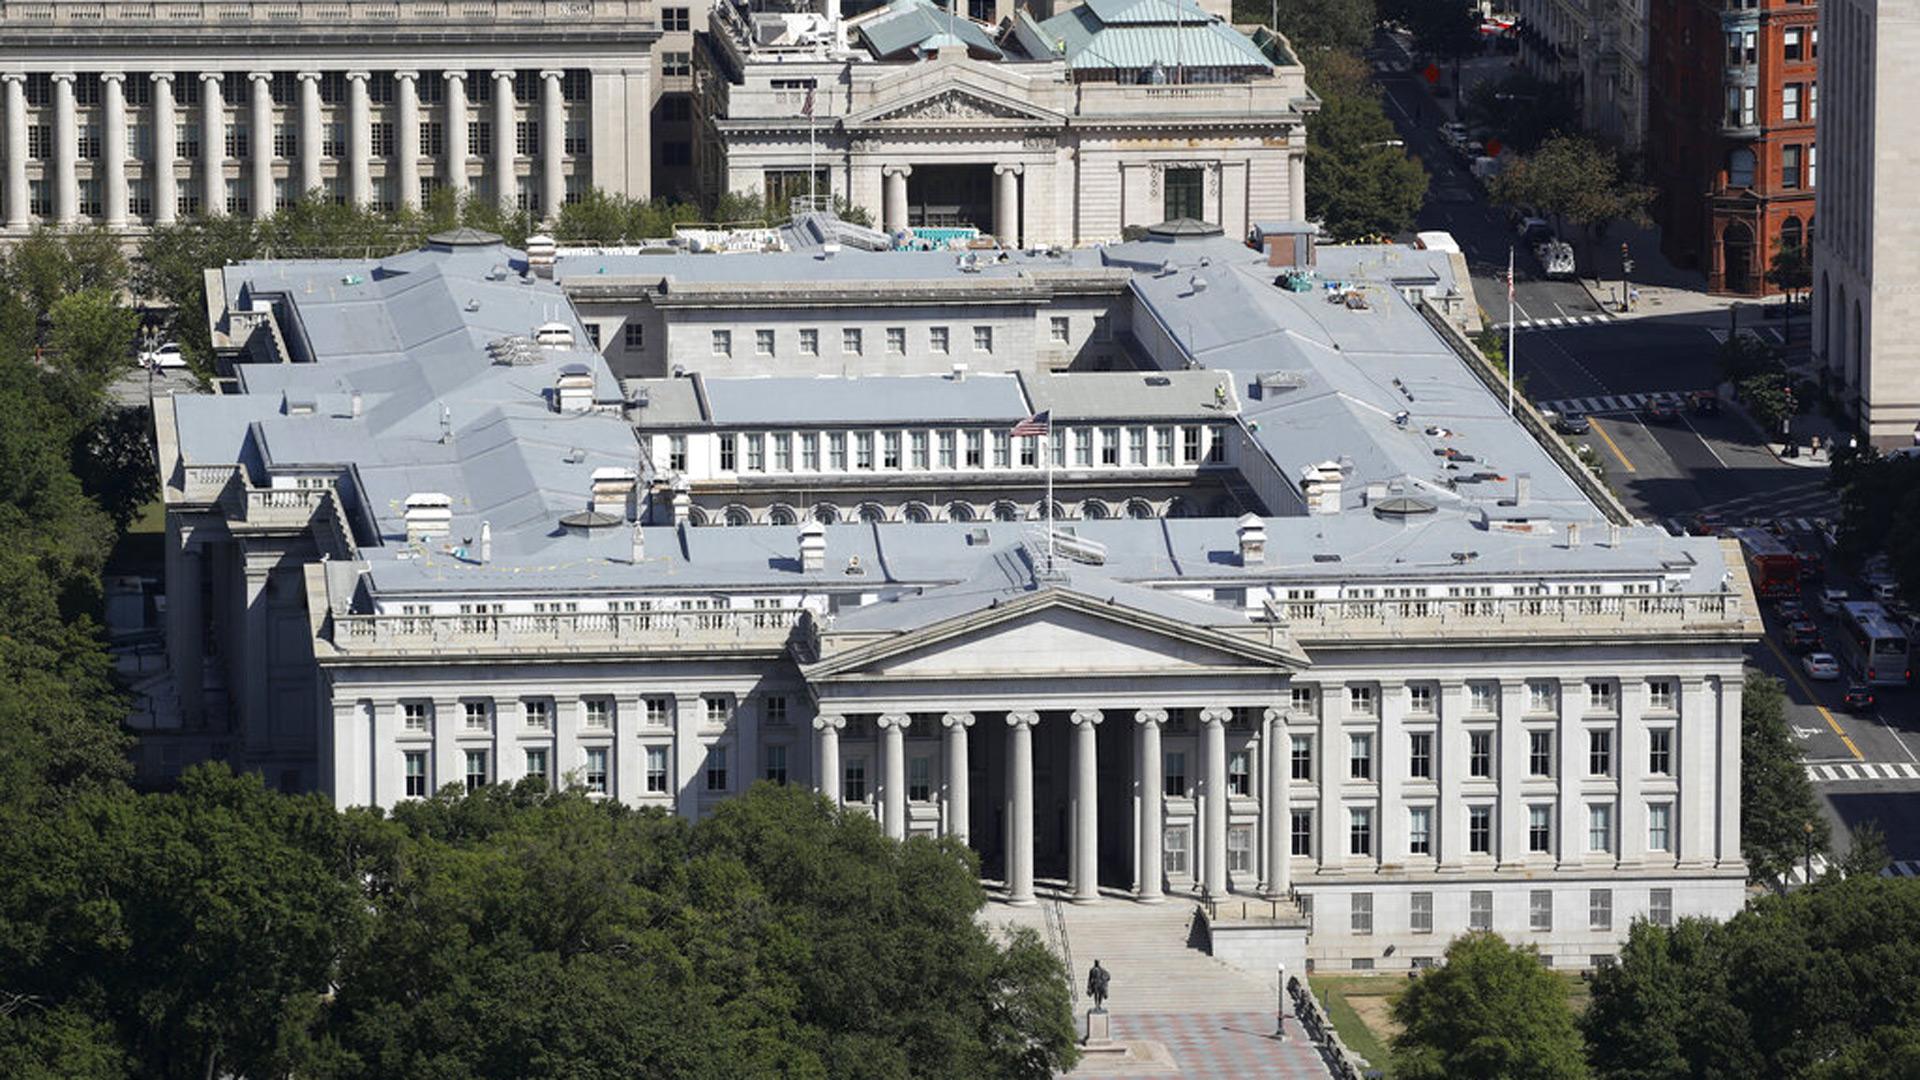 The U.S. Treasury Department building viewed from the Washington Monument, Wednesday, Sept. 18, 2019, in Washington. (AP Photo/Patrick Semansky, file)